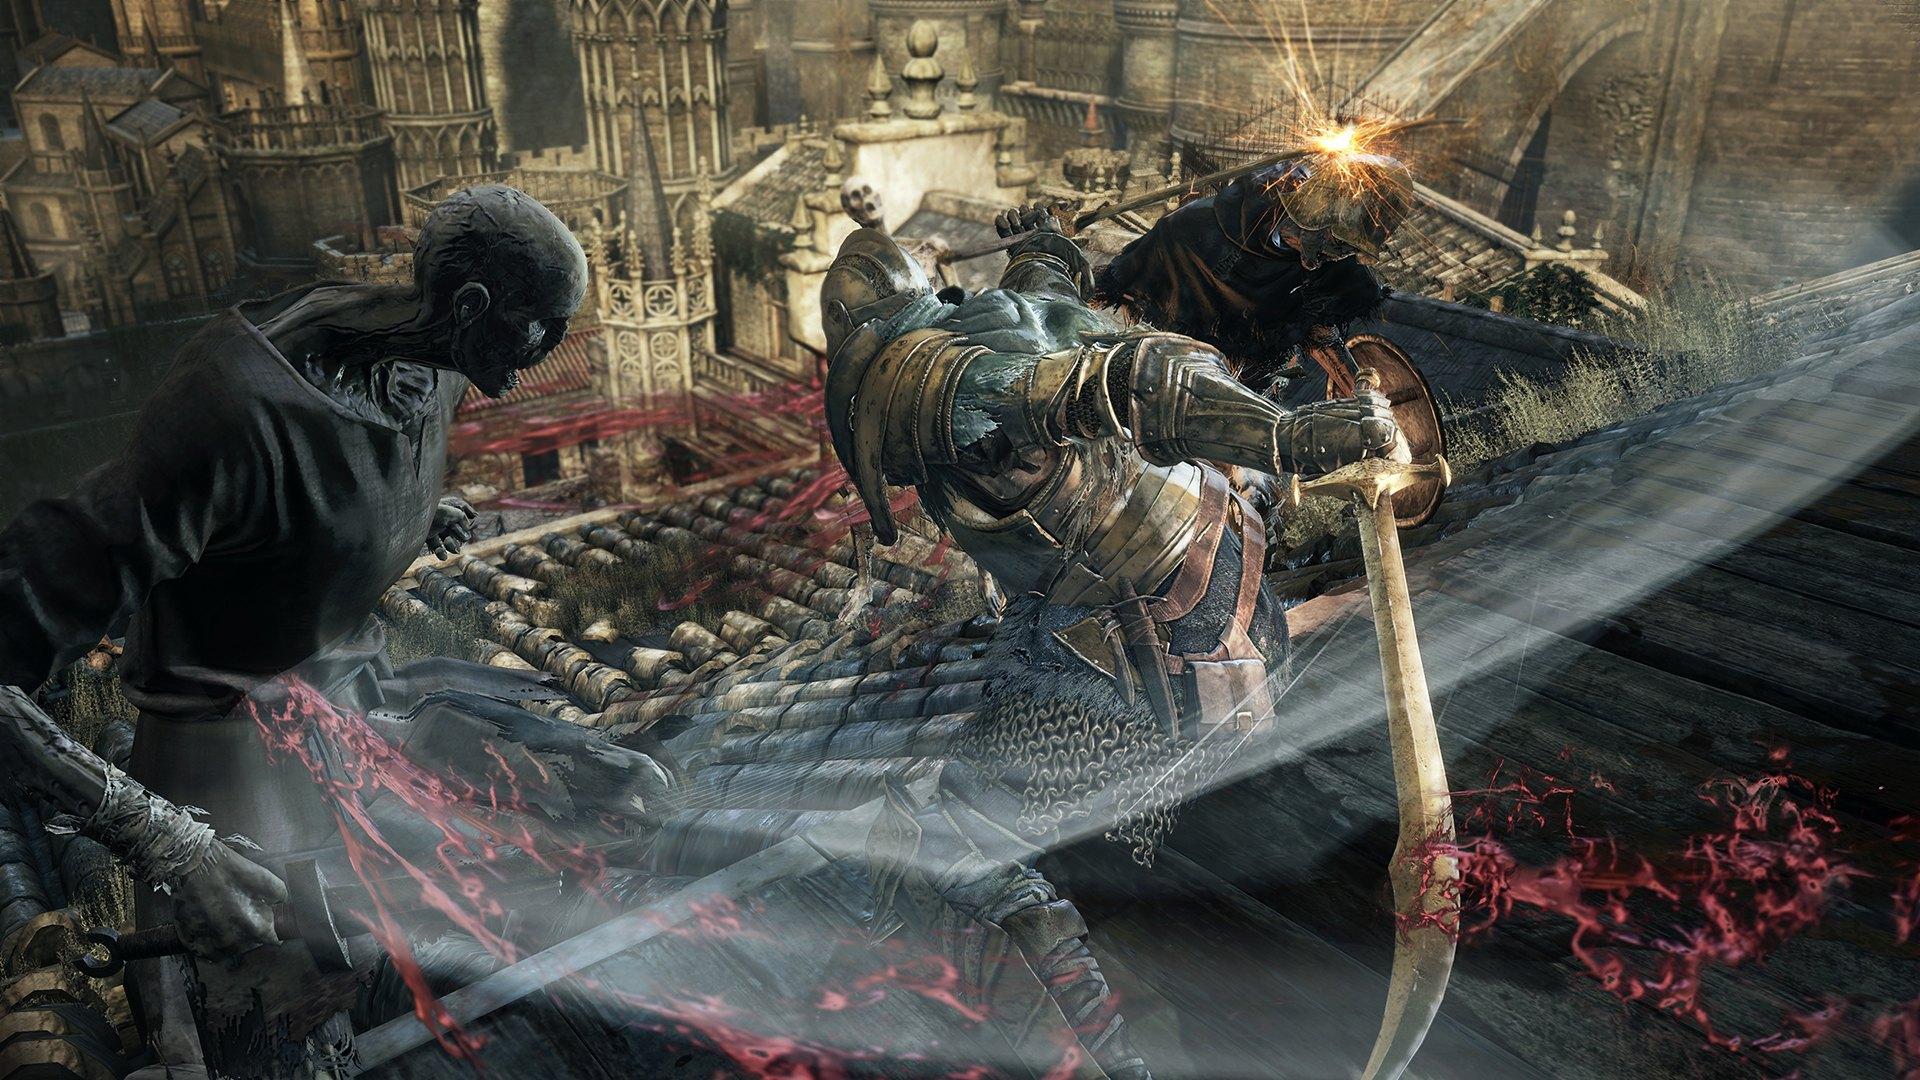 Dark Souls 3 Magic System Uses Demon's Souls MP Bar, Gets